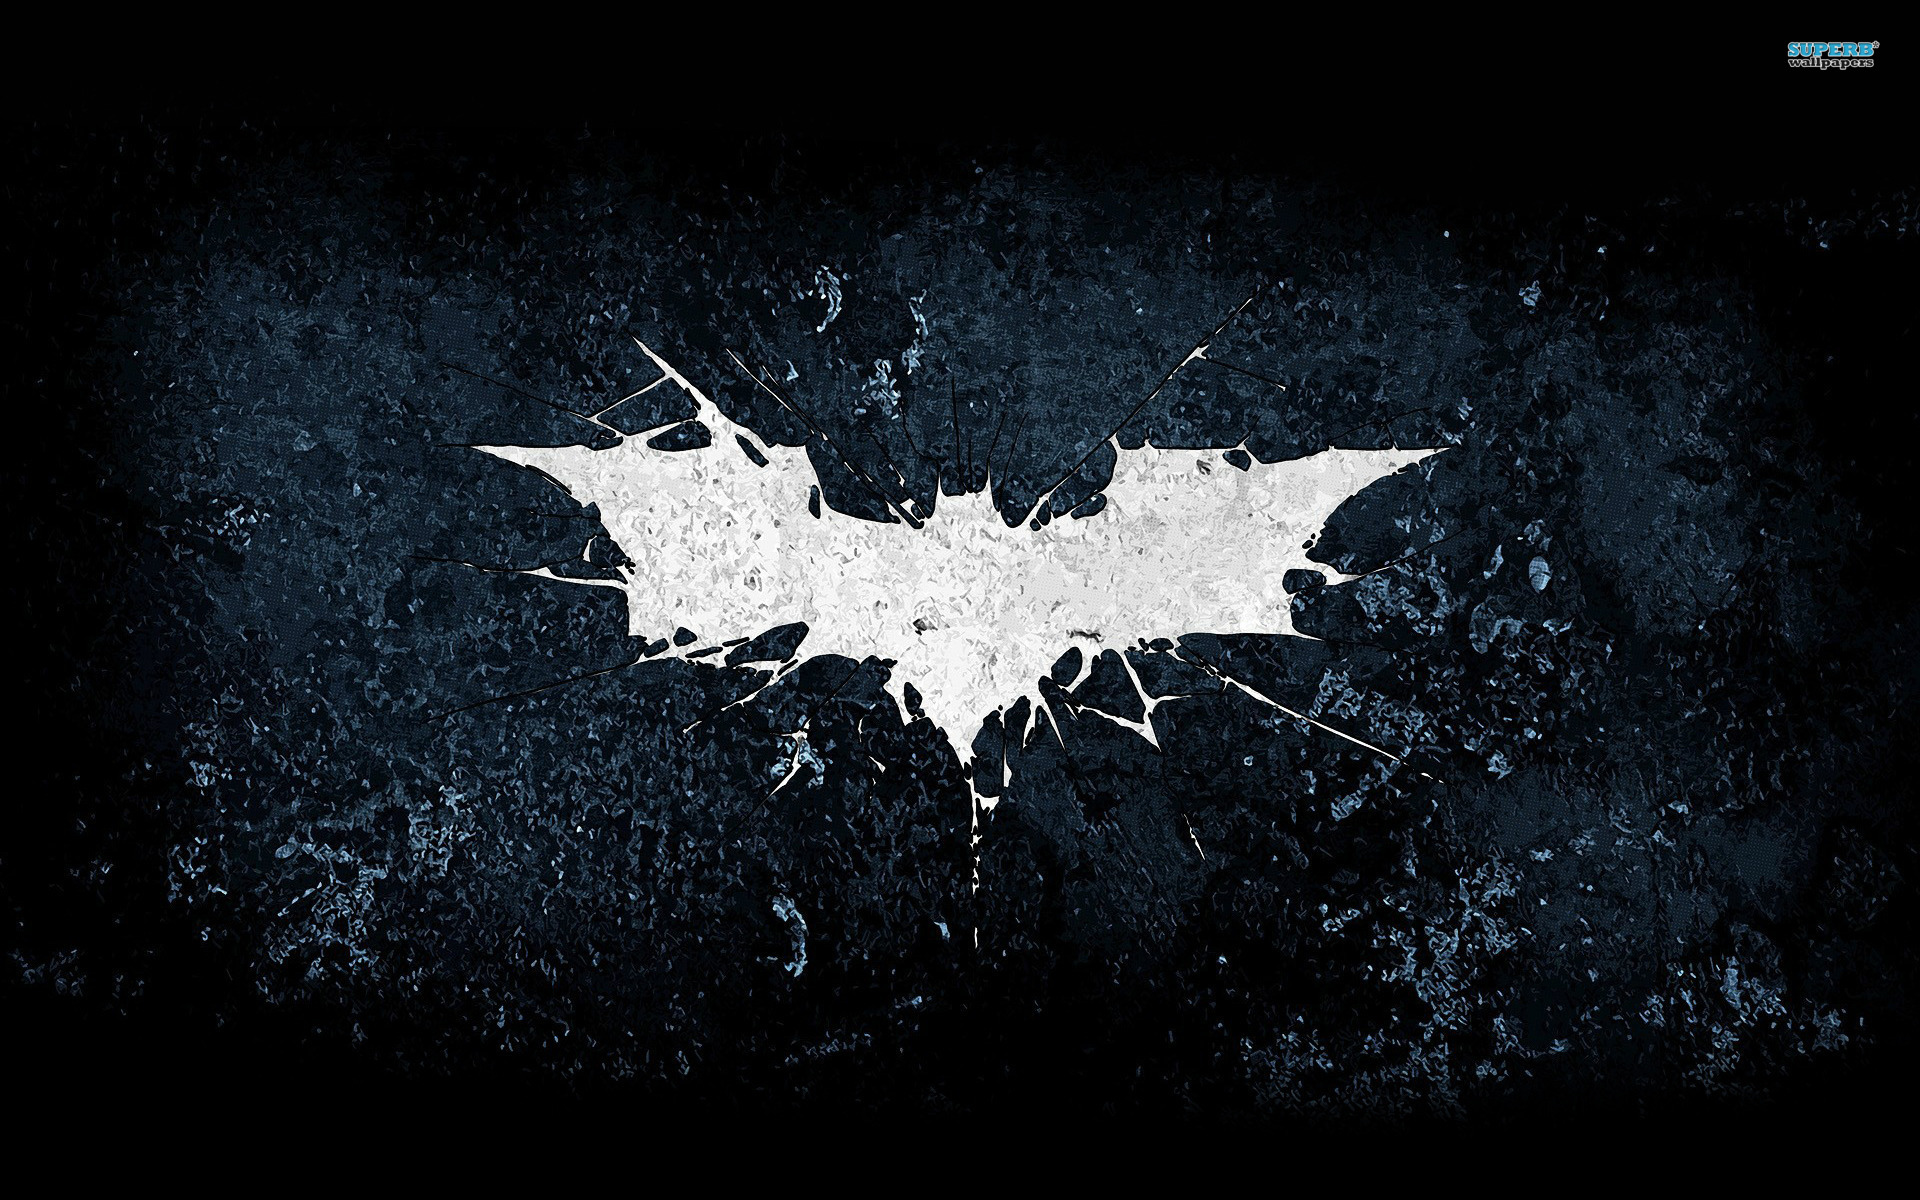 4k Batman Background Texture Wallpaper | Wide Screen Wallpaper 1080p,2K,4K